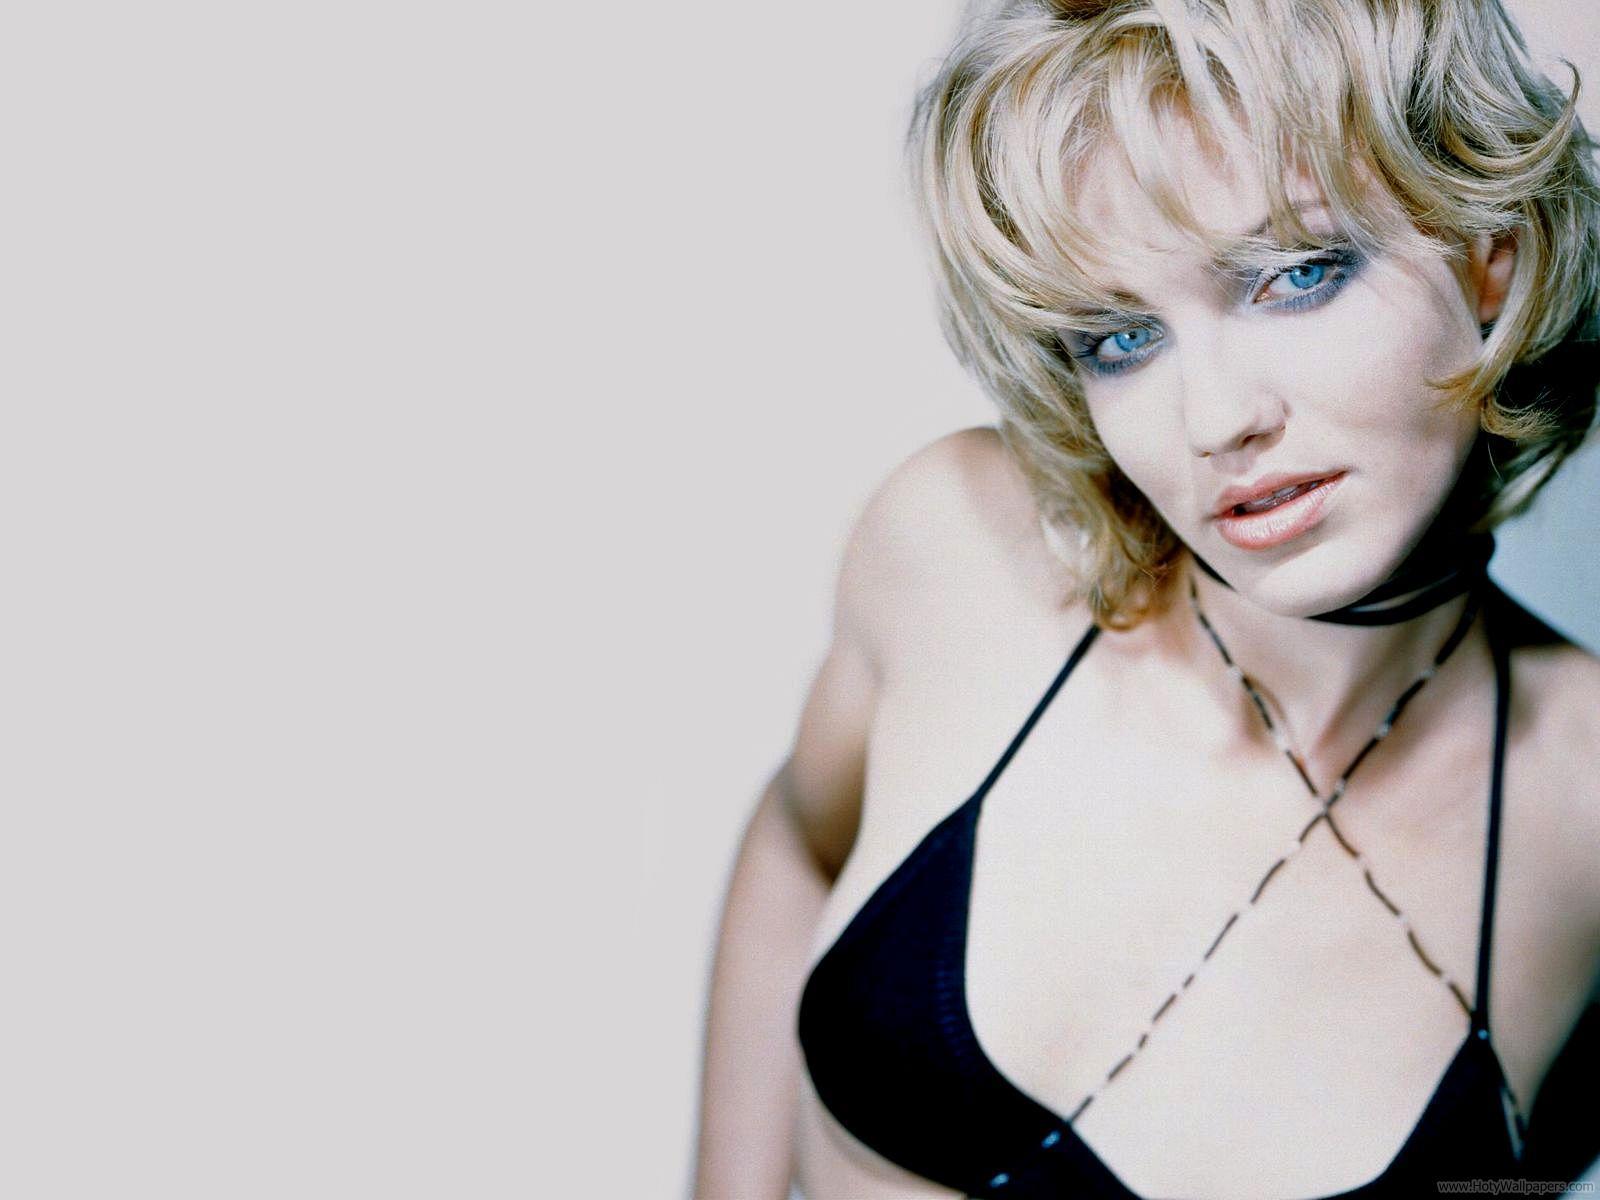 http://3.bp.blogspot.com/-Cxx4i_5pr3U/Tr0rehwpF1I/AAAAAAAAAe8/1sI0n_PWA2E/s1600/Cameron_Diaz_cute_actress-wallpaper.jpg